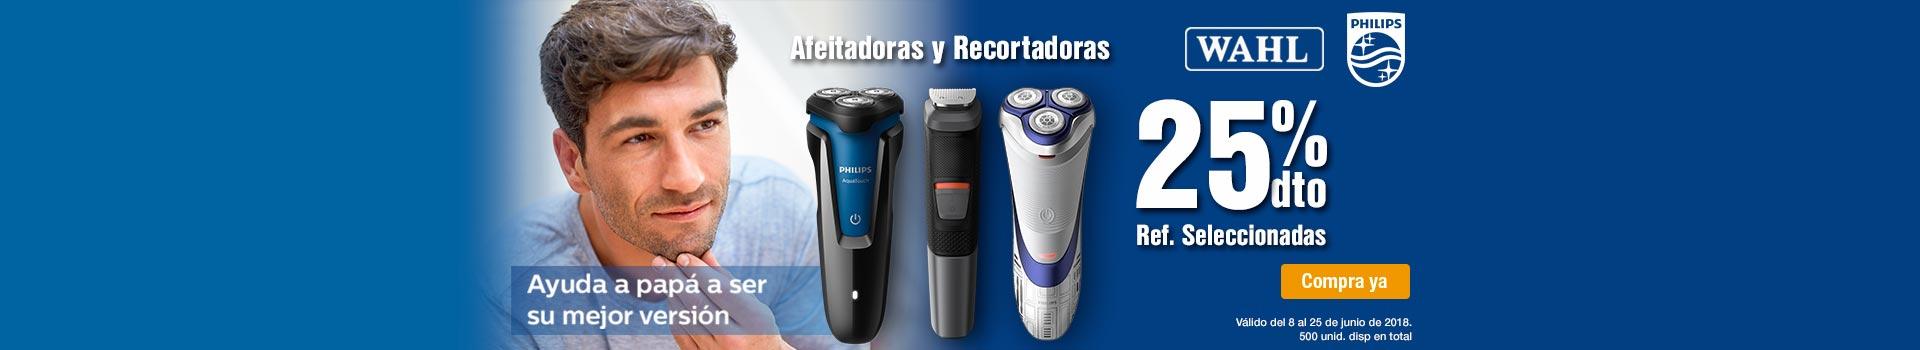 AK-KT-BCAT-1-MENORES-CPERSONAL--PHILIPS-AFEITADORAS-RECORTADORAS-Jun-9